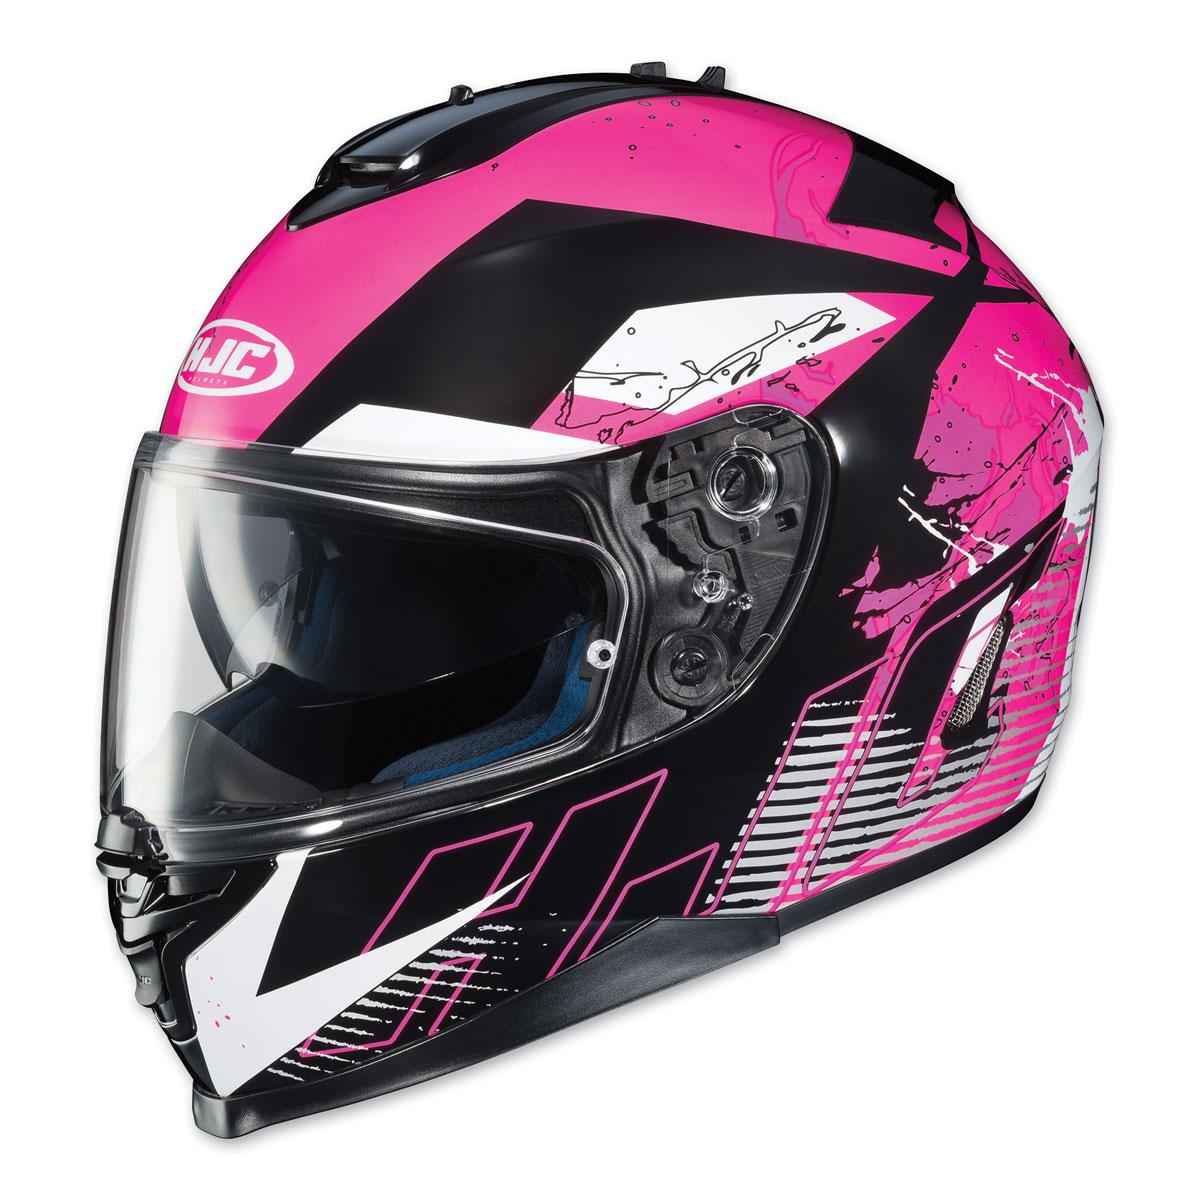 HJC IS-17 Blur Black/Pink Full Face Helmet